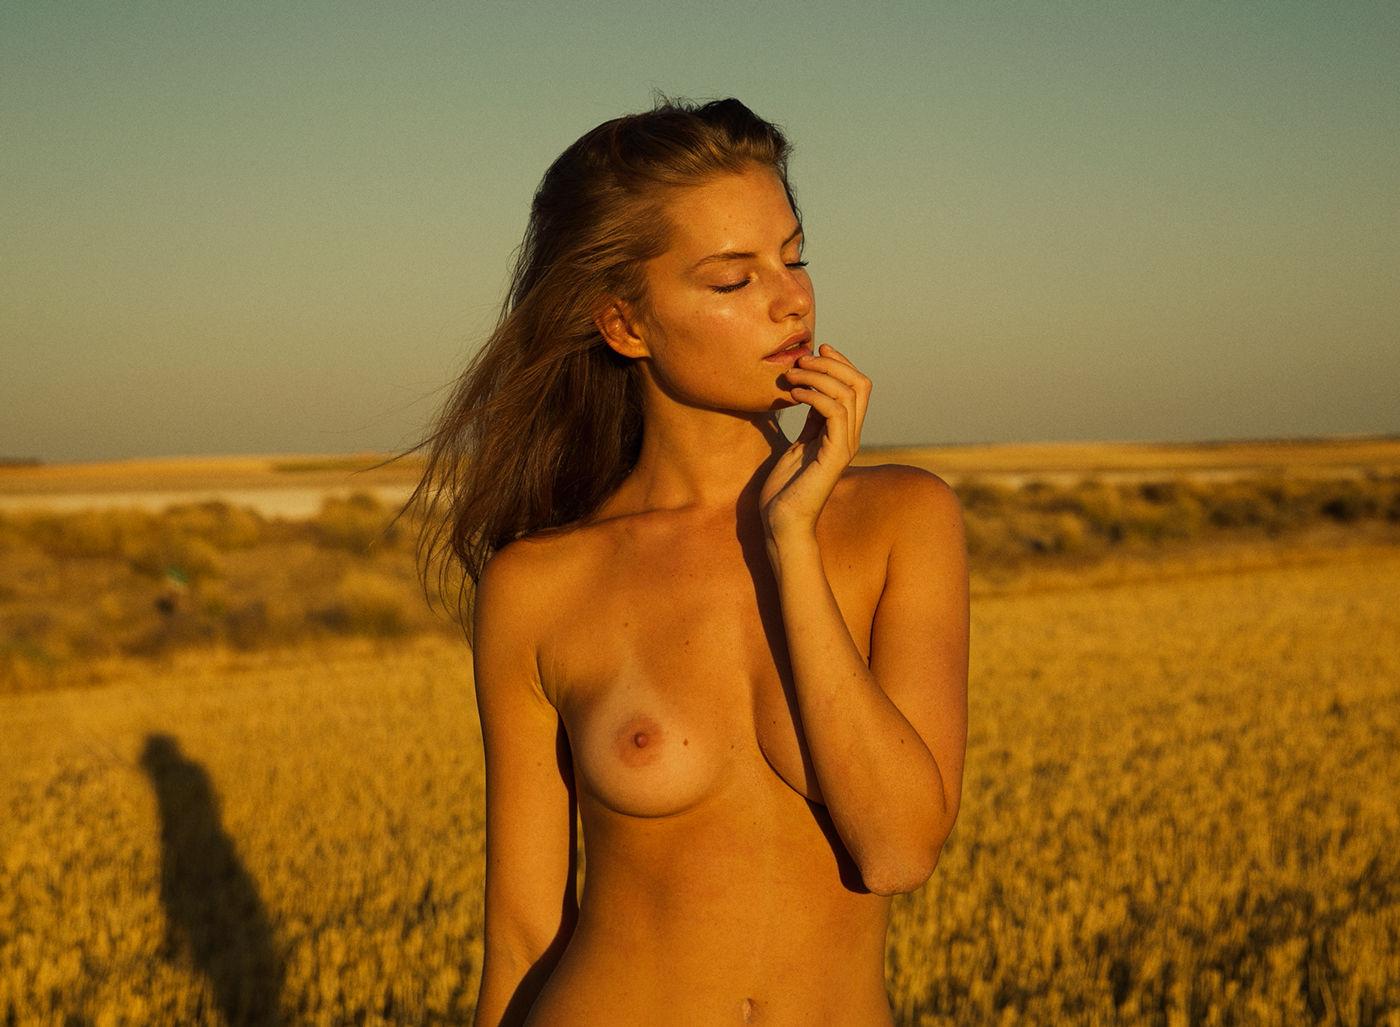 Widows mature nudes